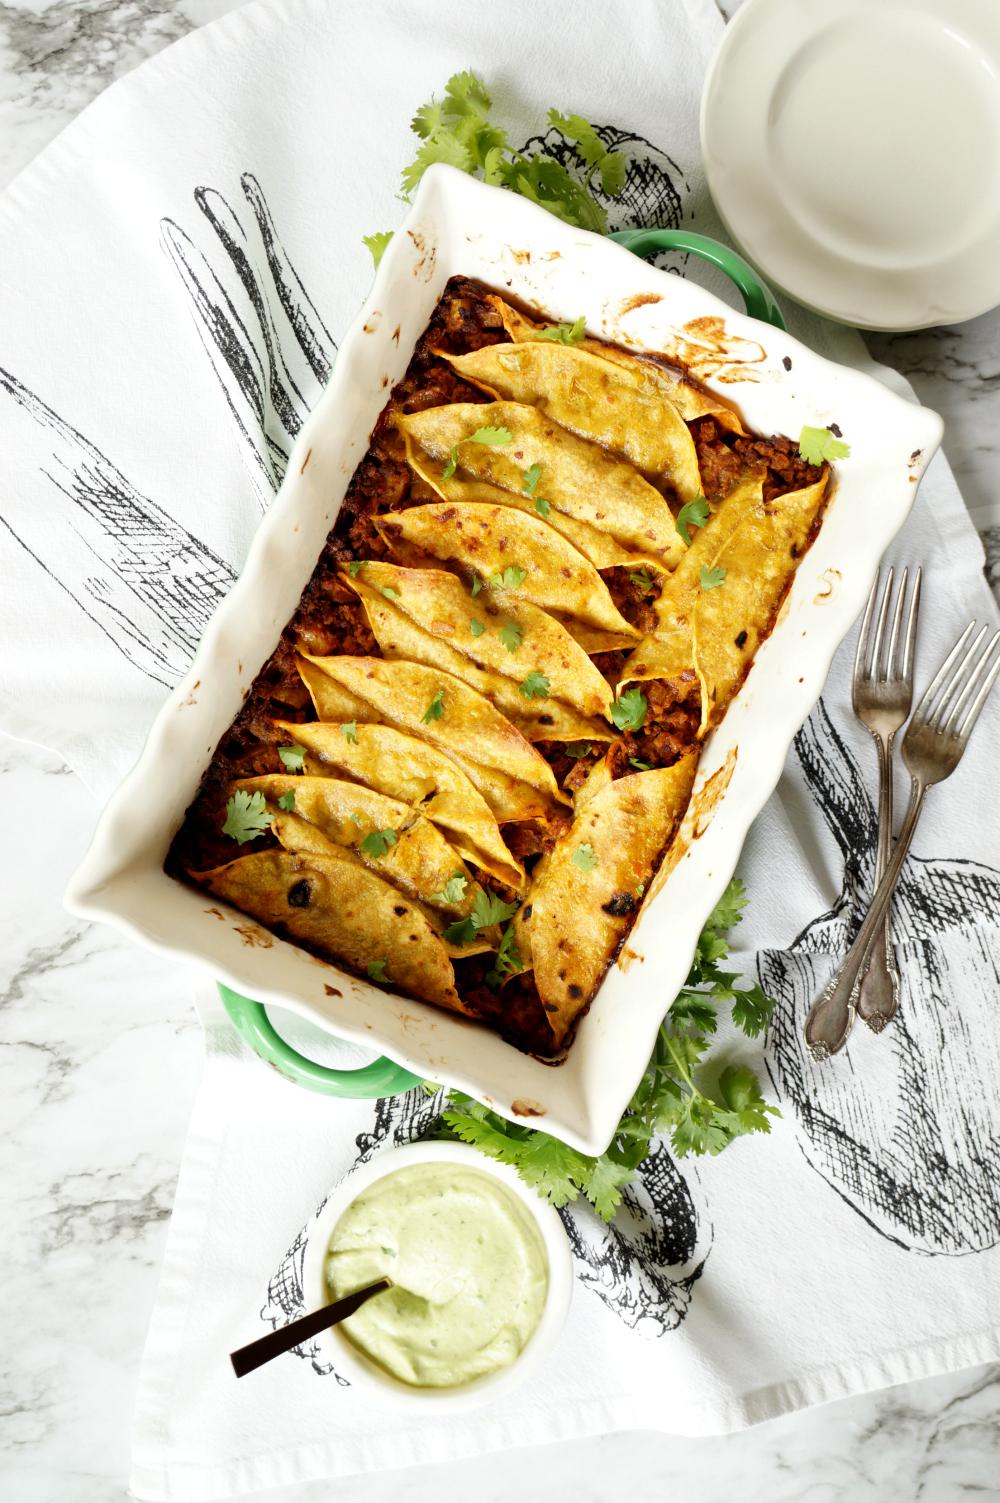 vegan breakfast enchiladas with avocado cashew cream | The Baking Fairy